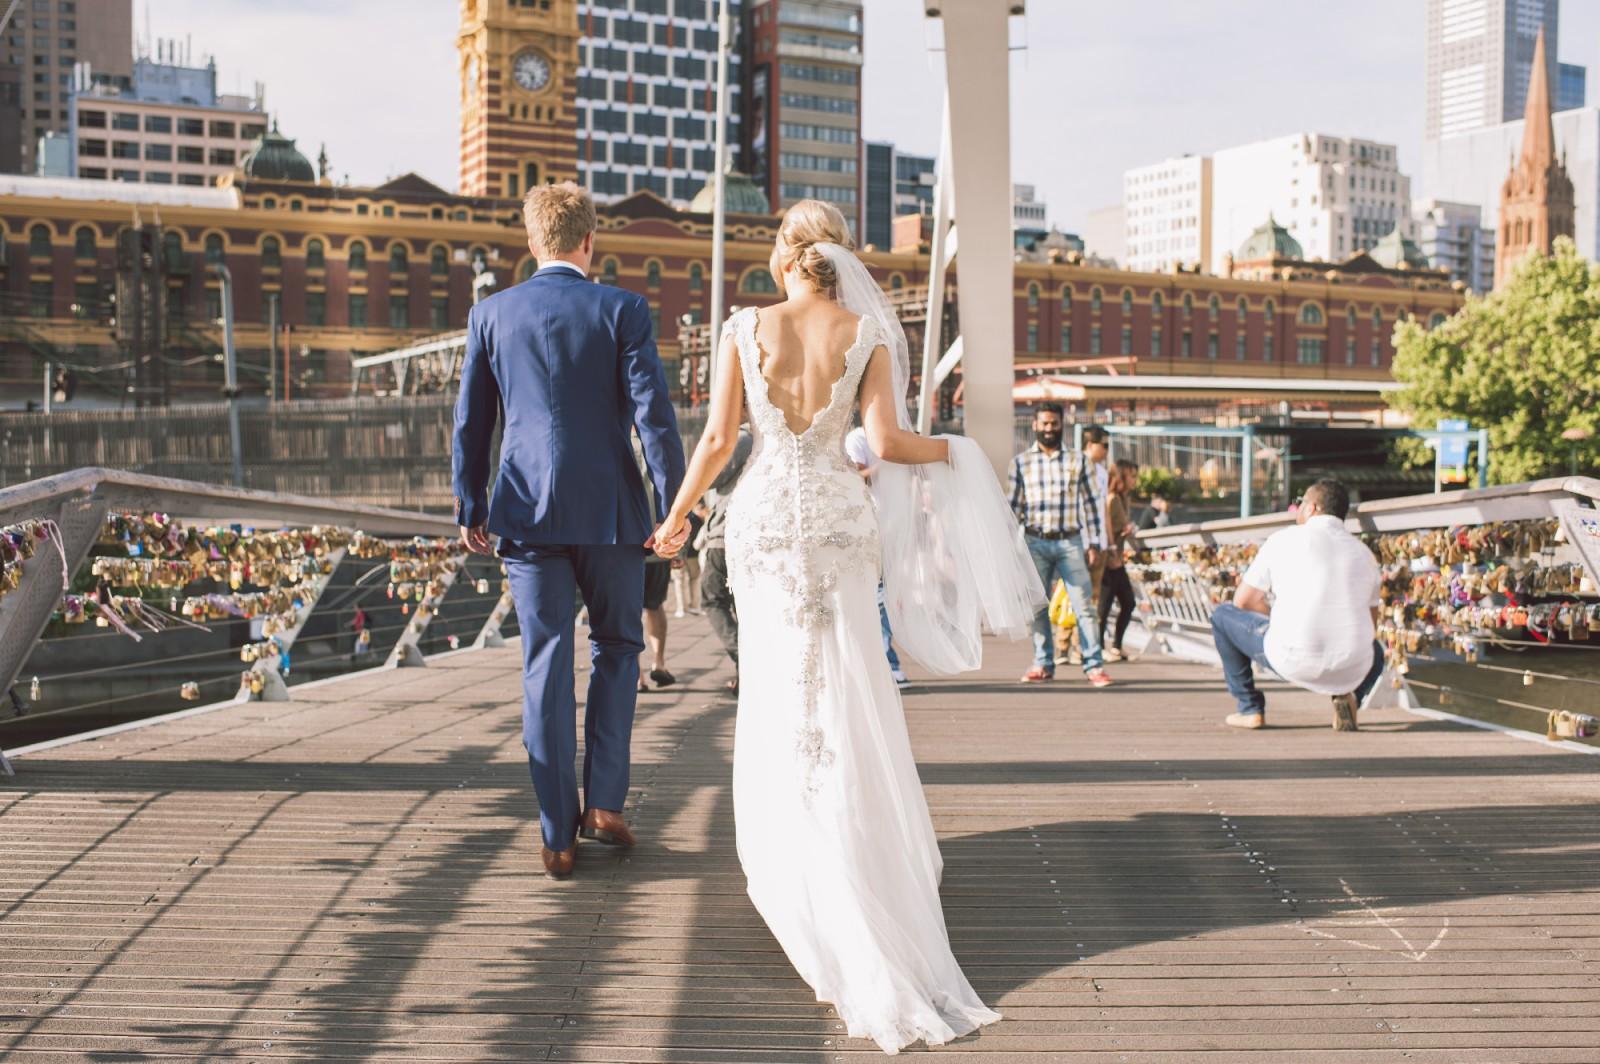 Jane Hill Second Hand Wedding Dress On Sale 50% Off